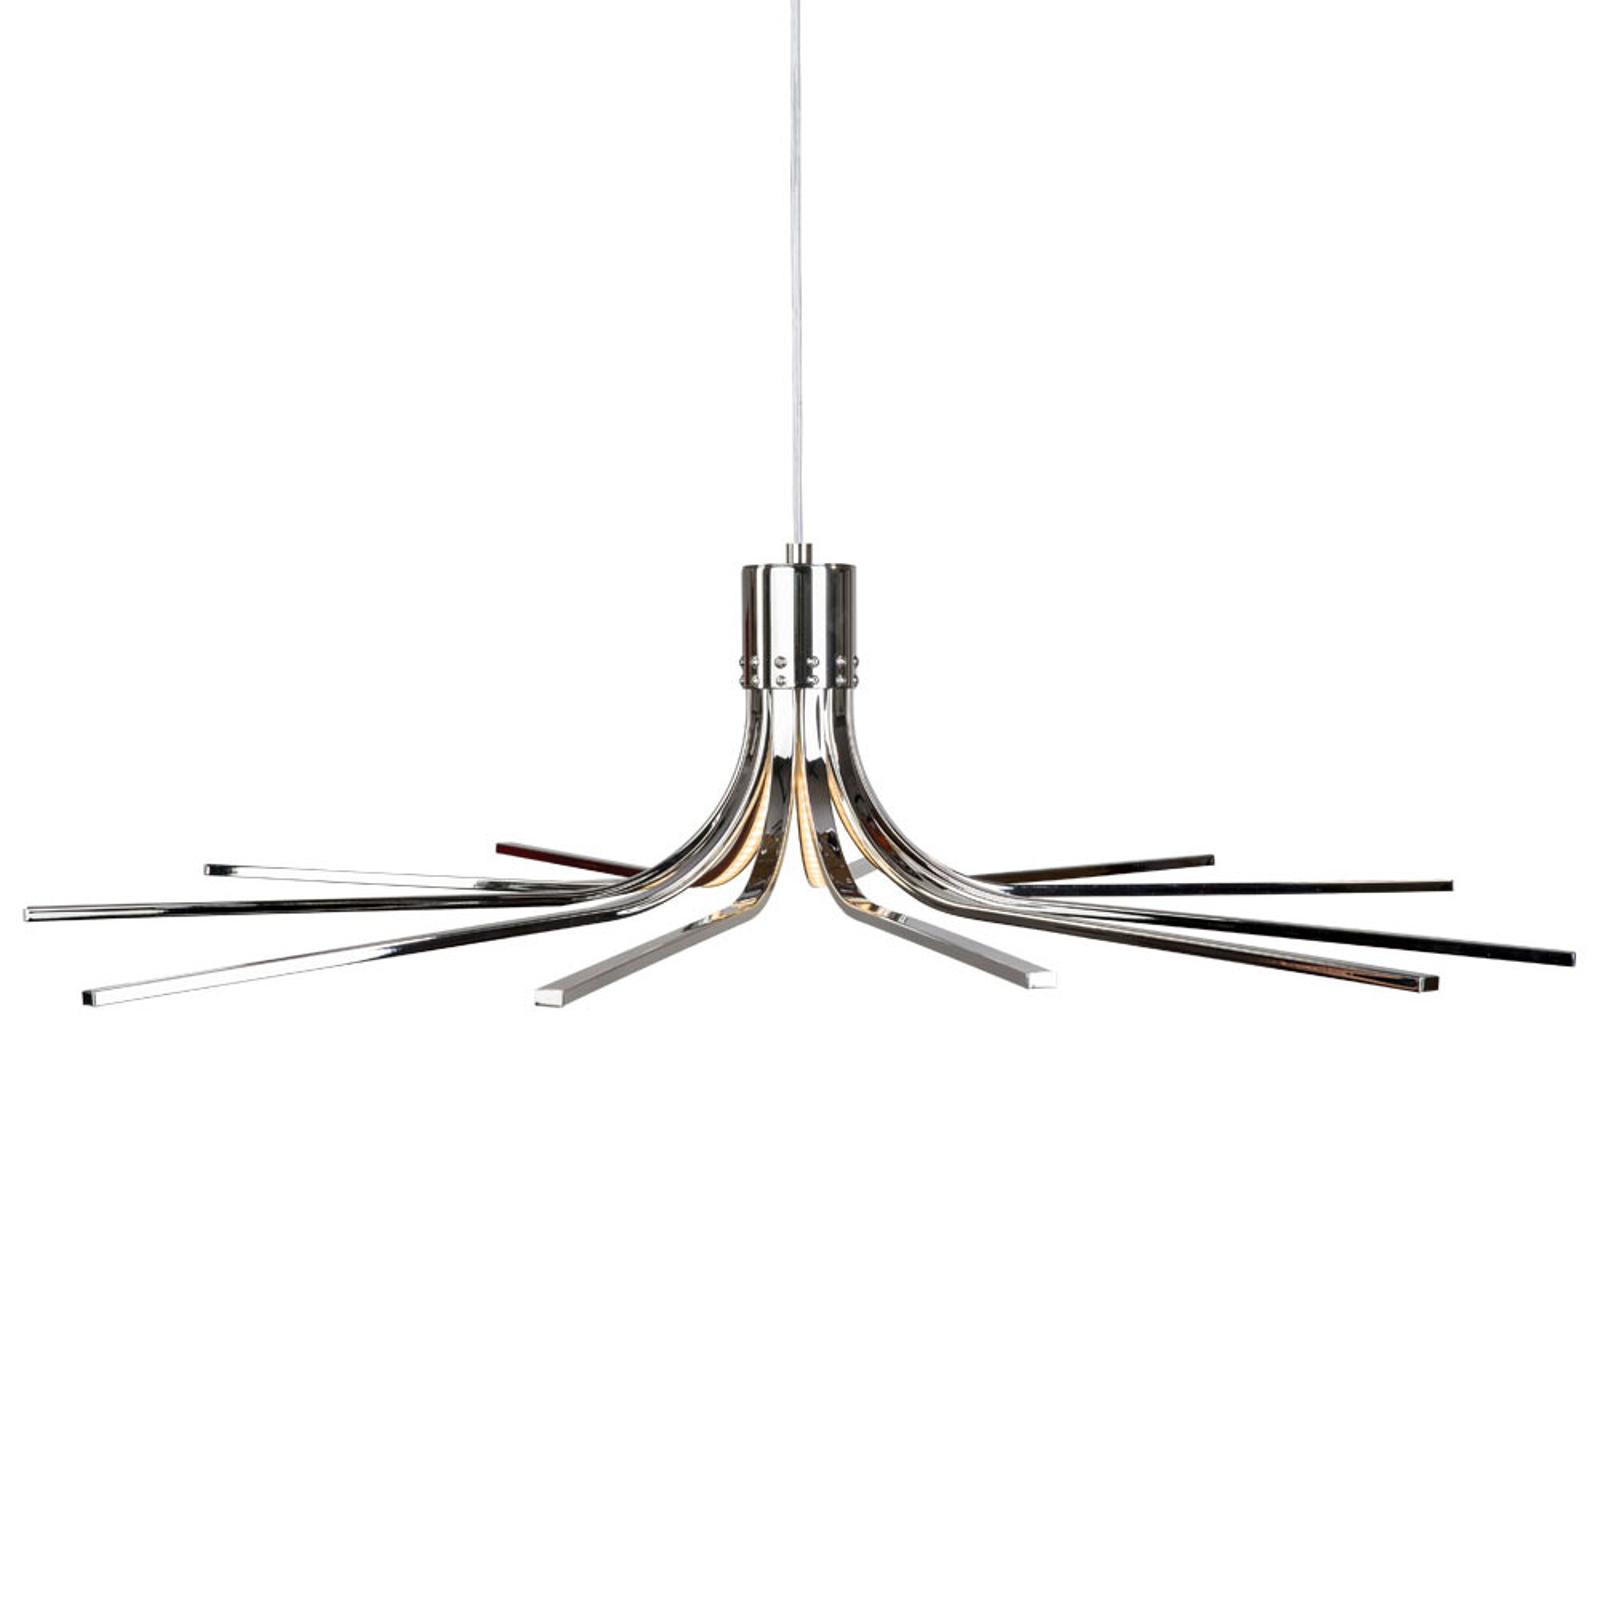 Lampa wisząca LED Torino chrom Ø 78 cm